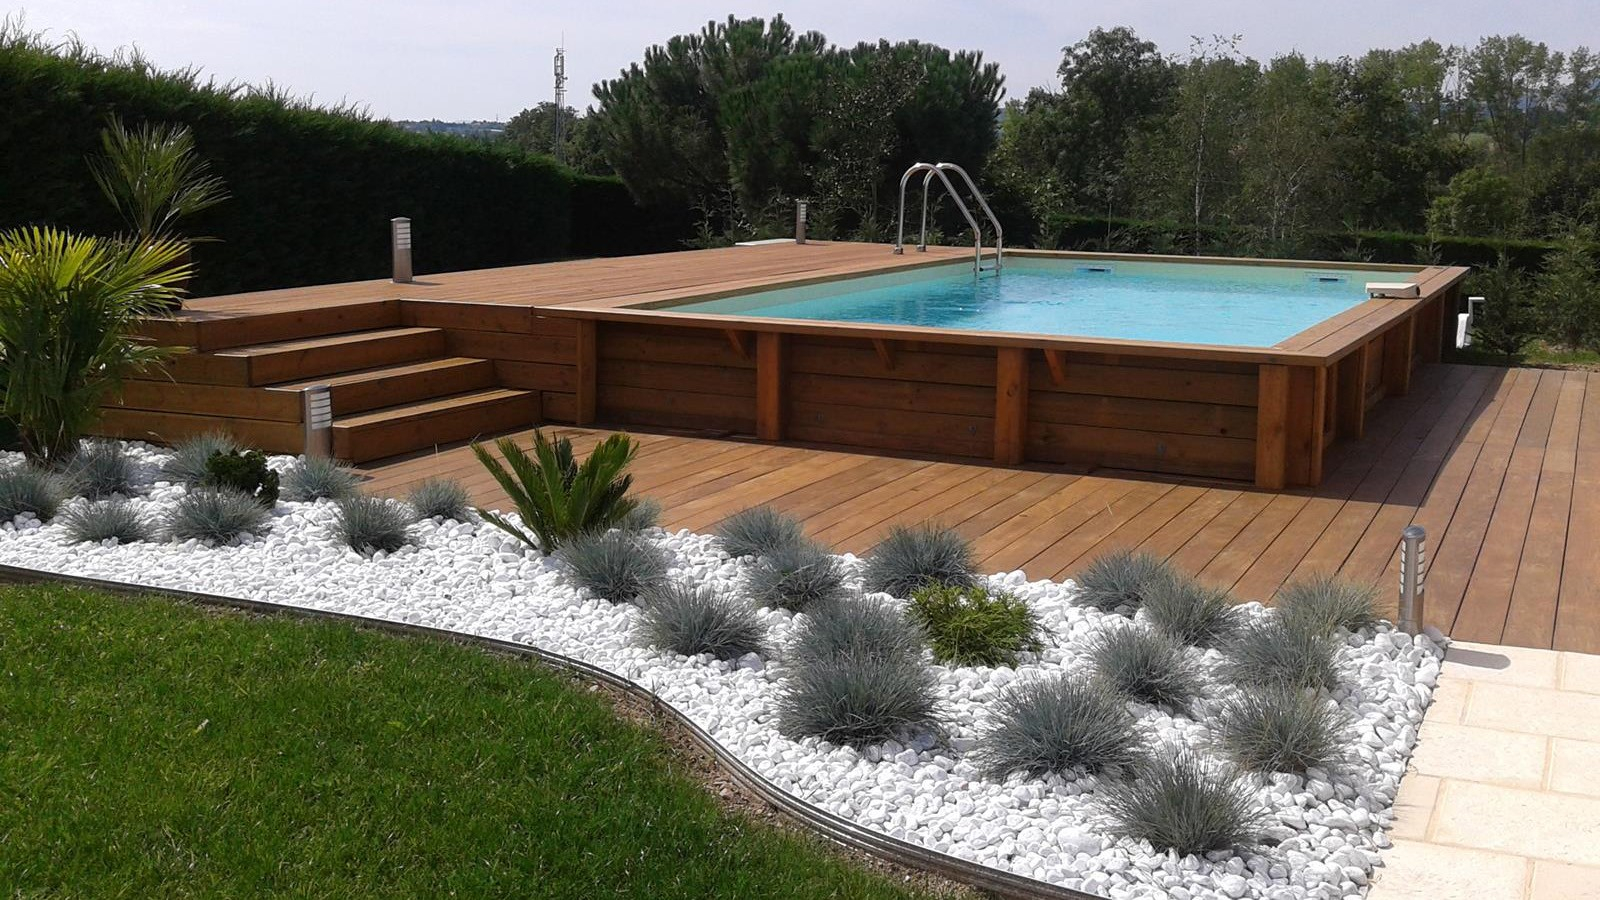 Terrasse En Bois Pour Piscine Hors Sol Terrasse En Bois